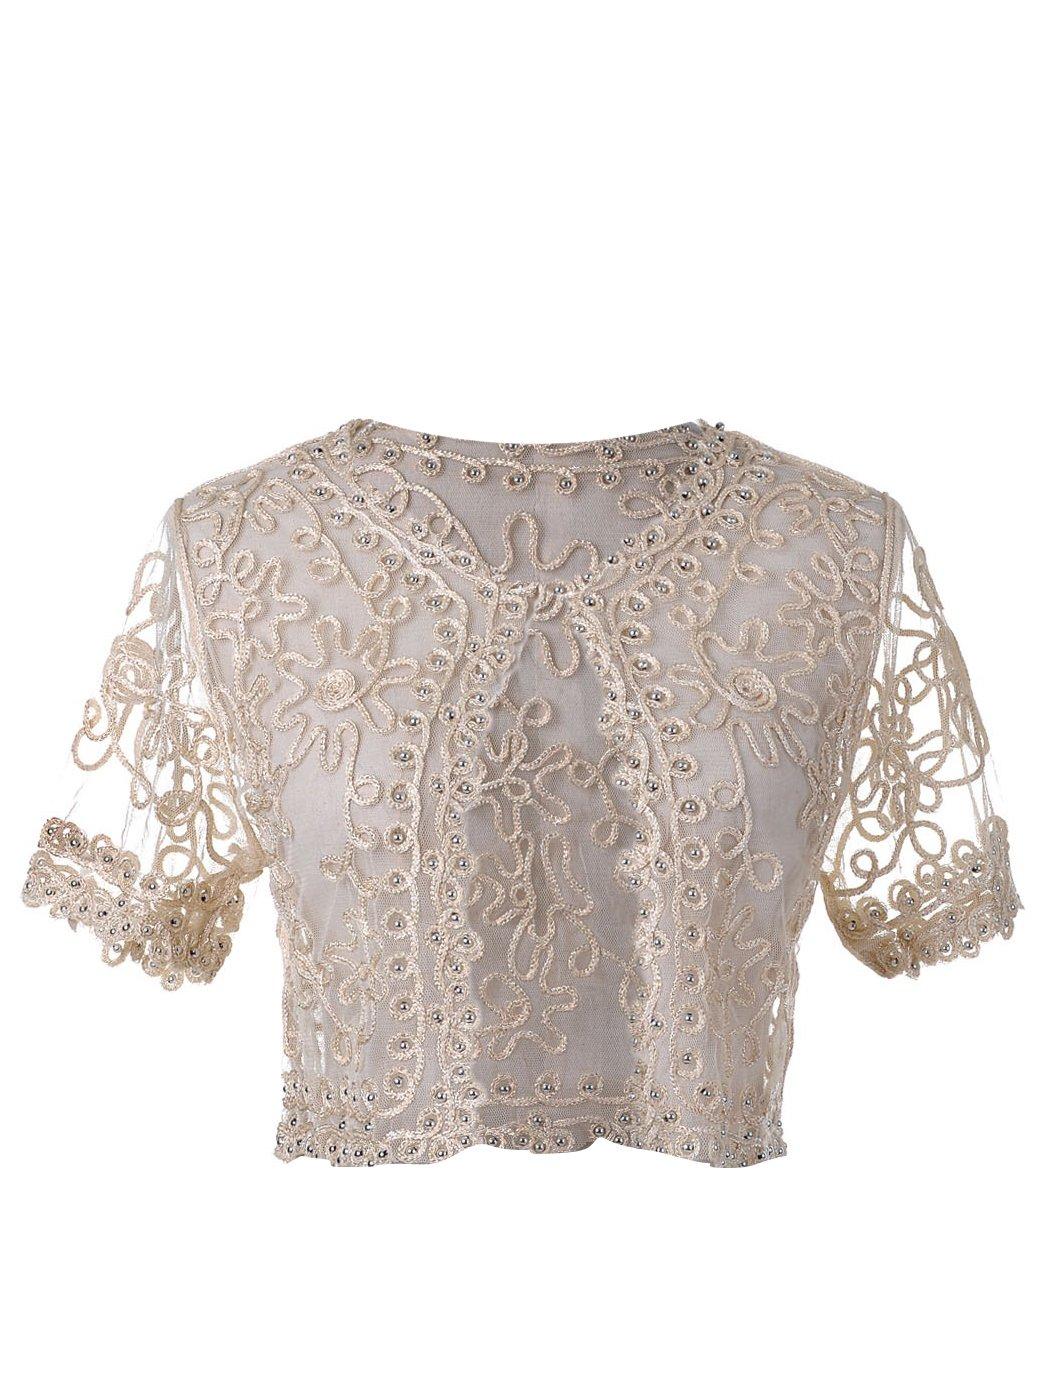 Anna-Kaci Demure Elegance Crochet Beaded Mesh Lace Evening Cover Up Bolero Shrug, Beige, Large